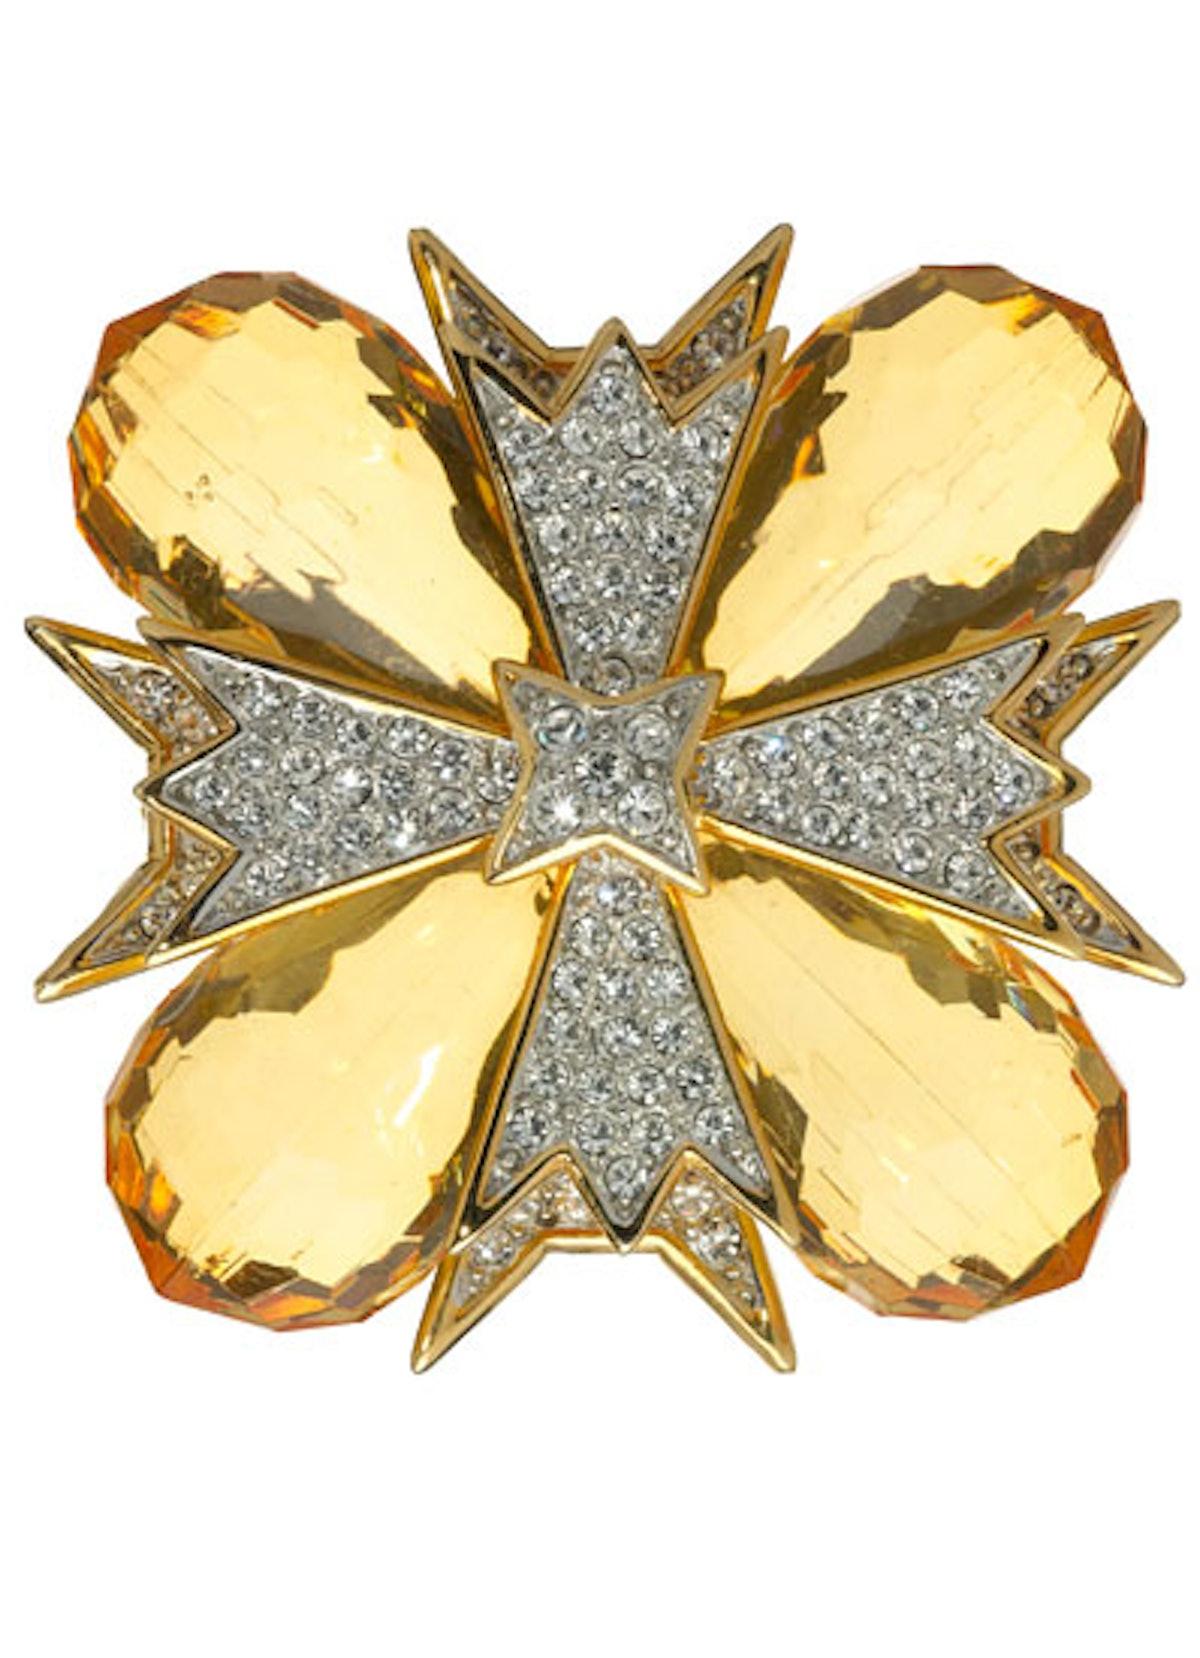 acss-gold-jewelry-02-v.jpg